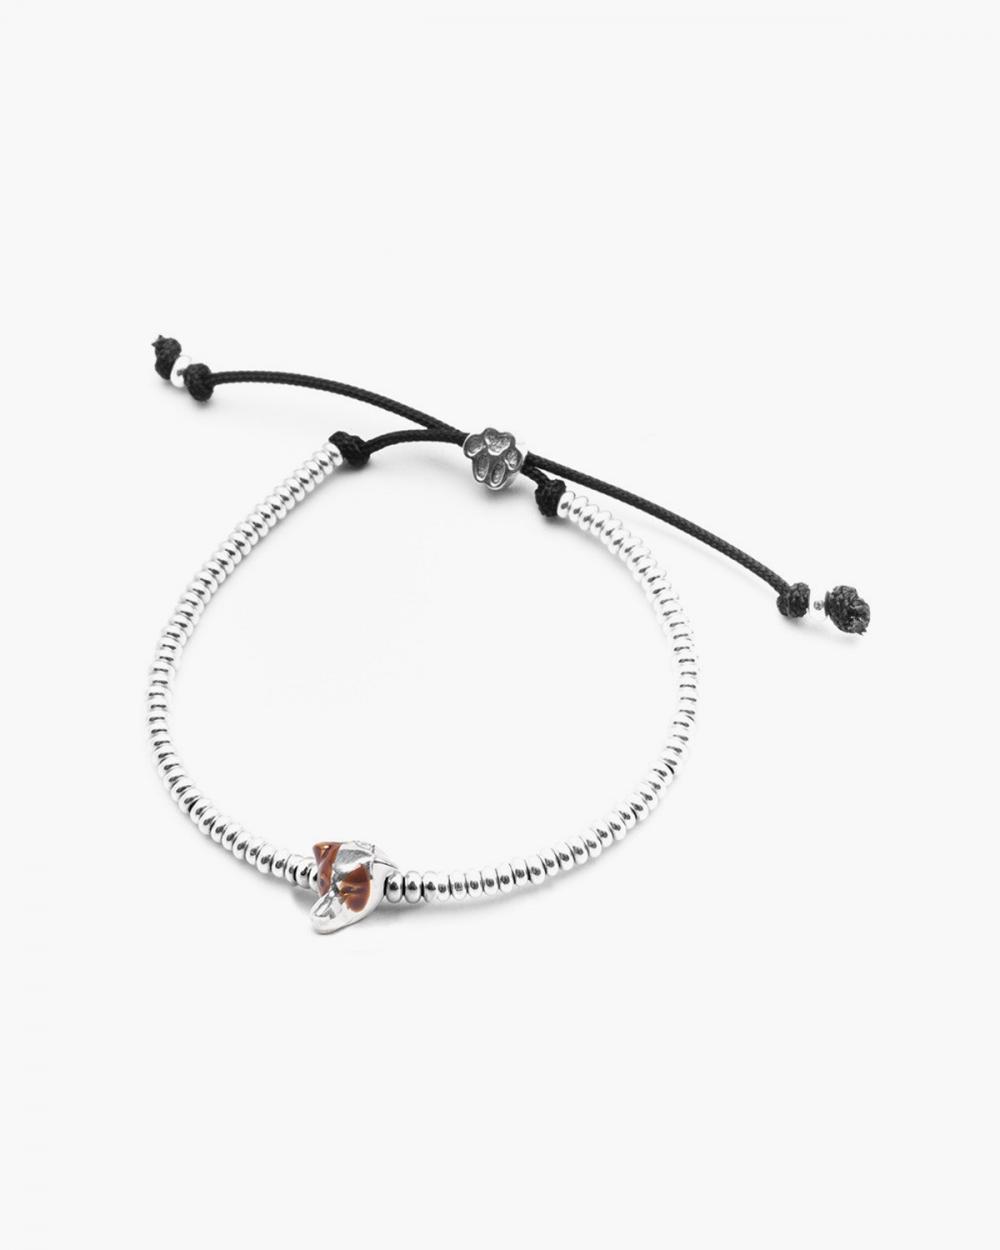 jack russell snout bracelet polished silver